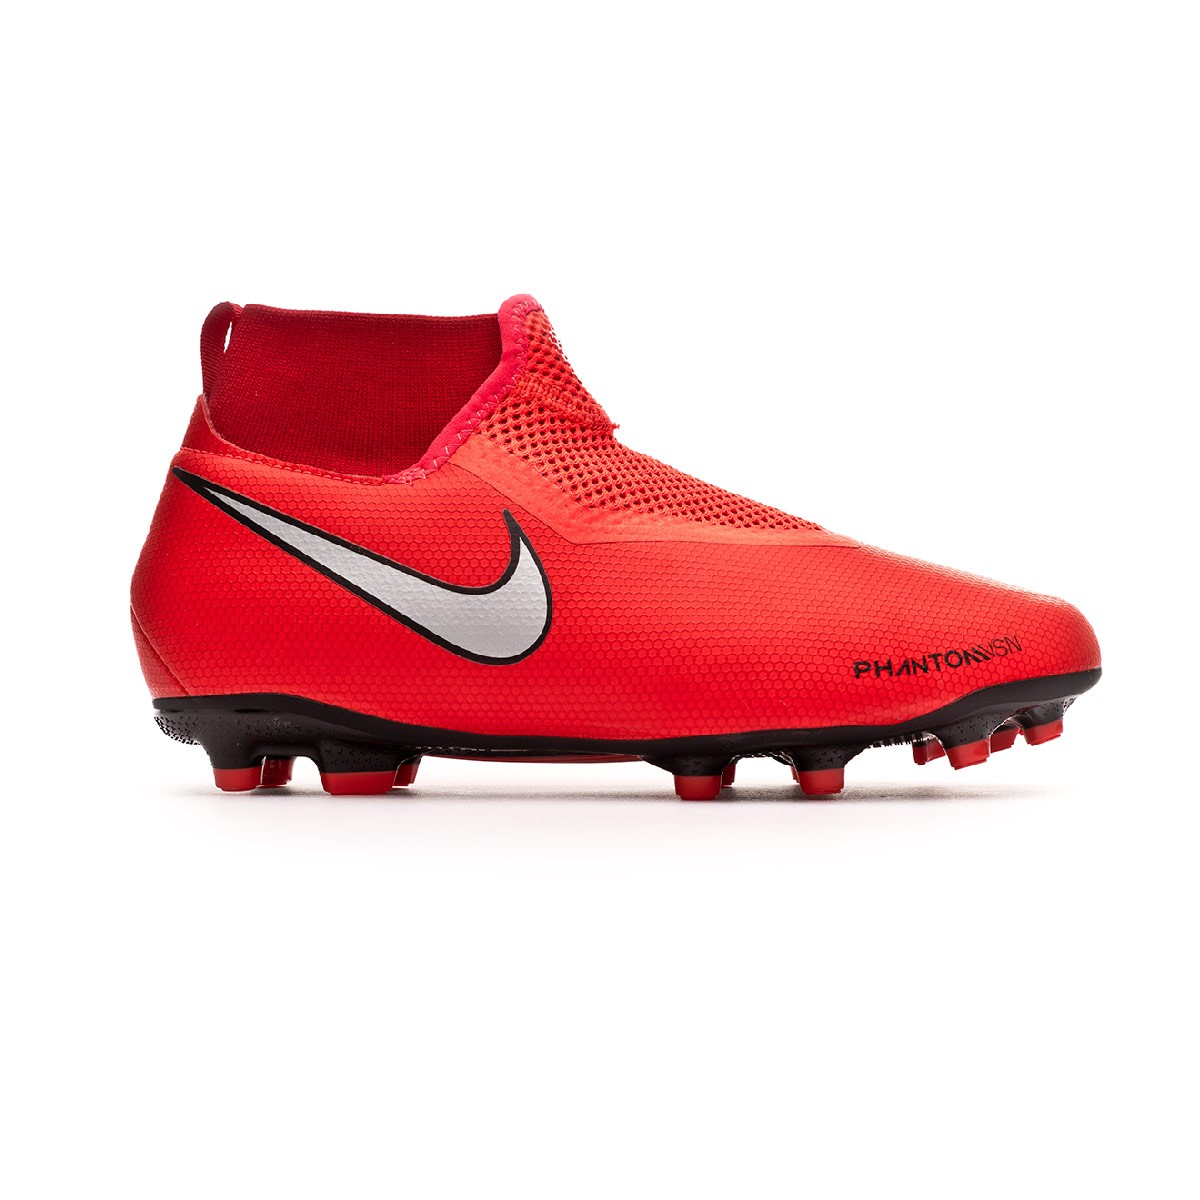 cd5a90d2996e6 Football Boots Nike Phantom Vision Academy DF FG MG Niño Bright  crimson-Metallic silver - Tienda de fútbol Fútbol Emotion